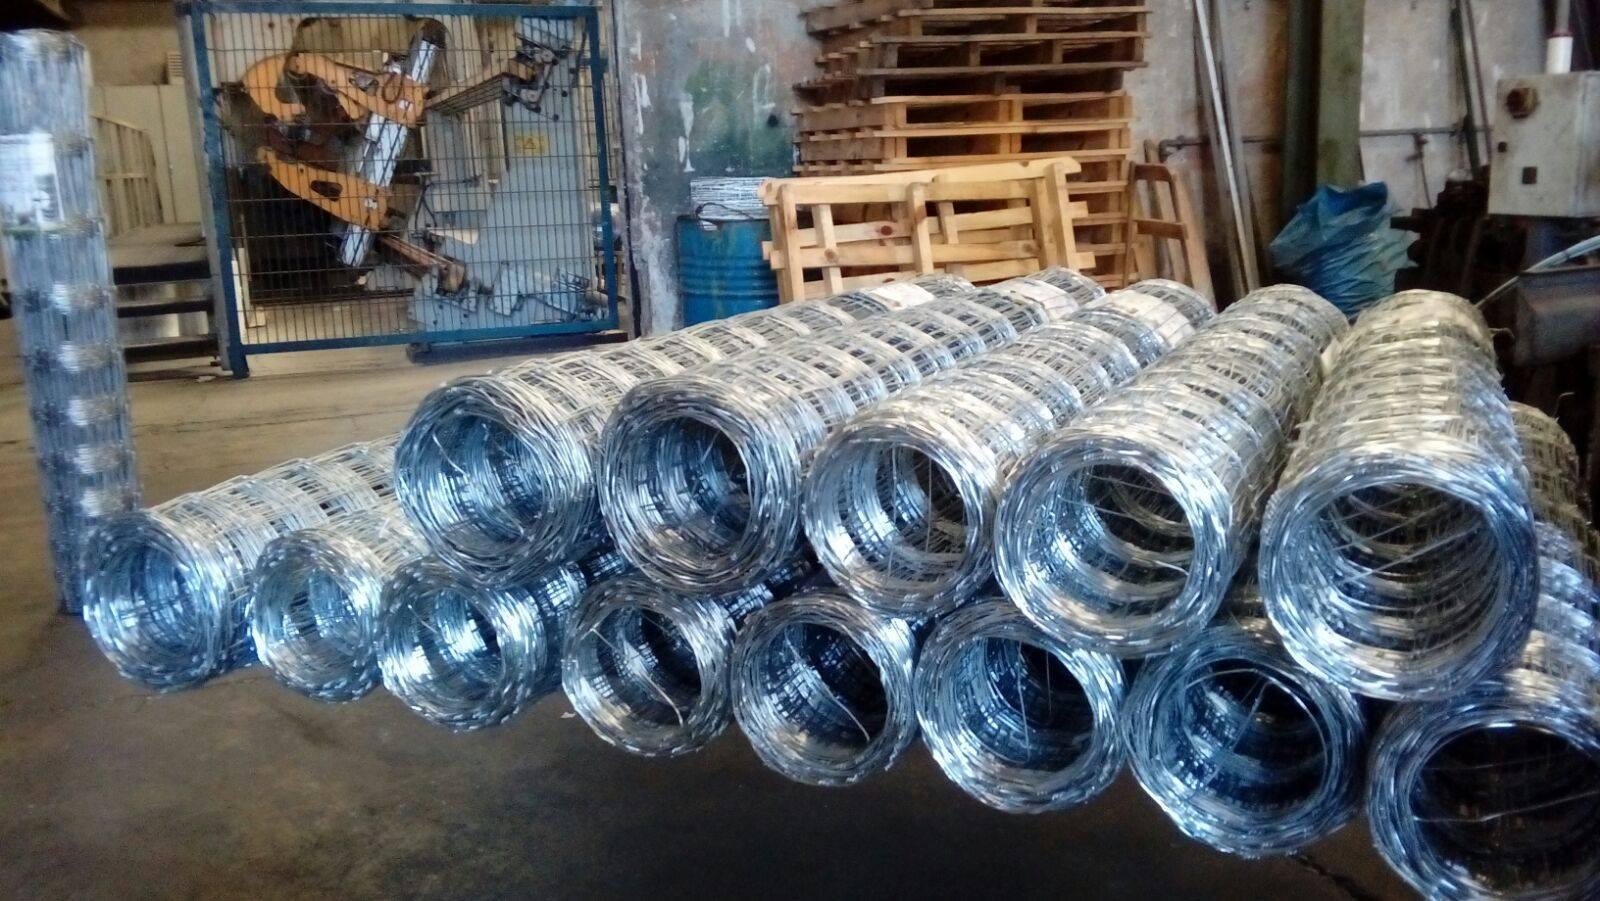 Reti e Pannelli - Reti Plastificate - Reti Zincate - Reti per l'Edilizia - Pannelli - Reti in plastica